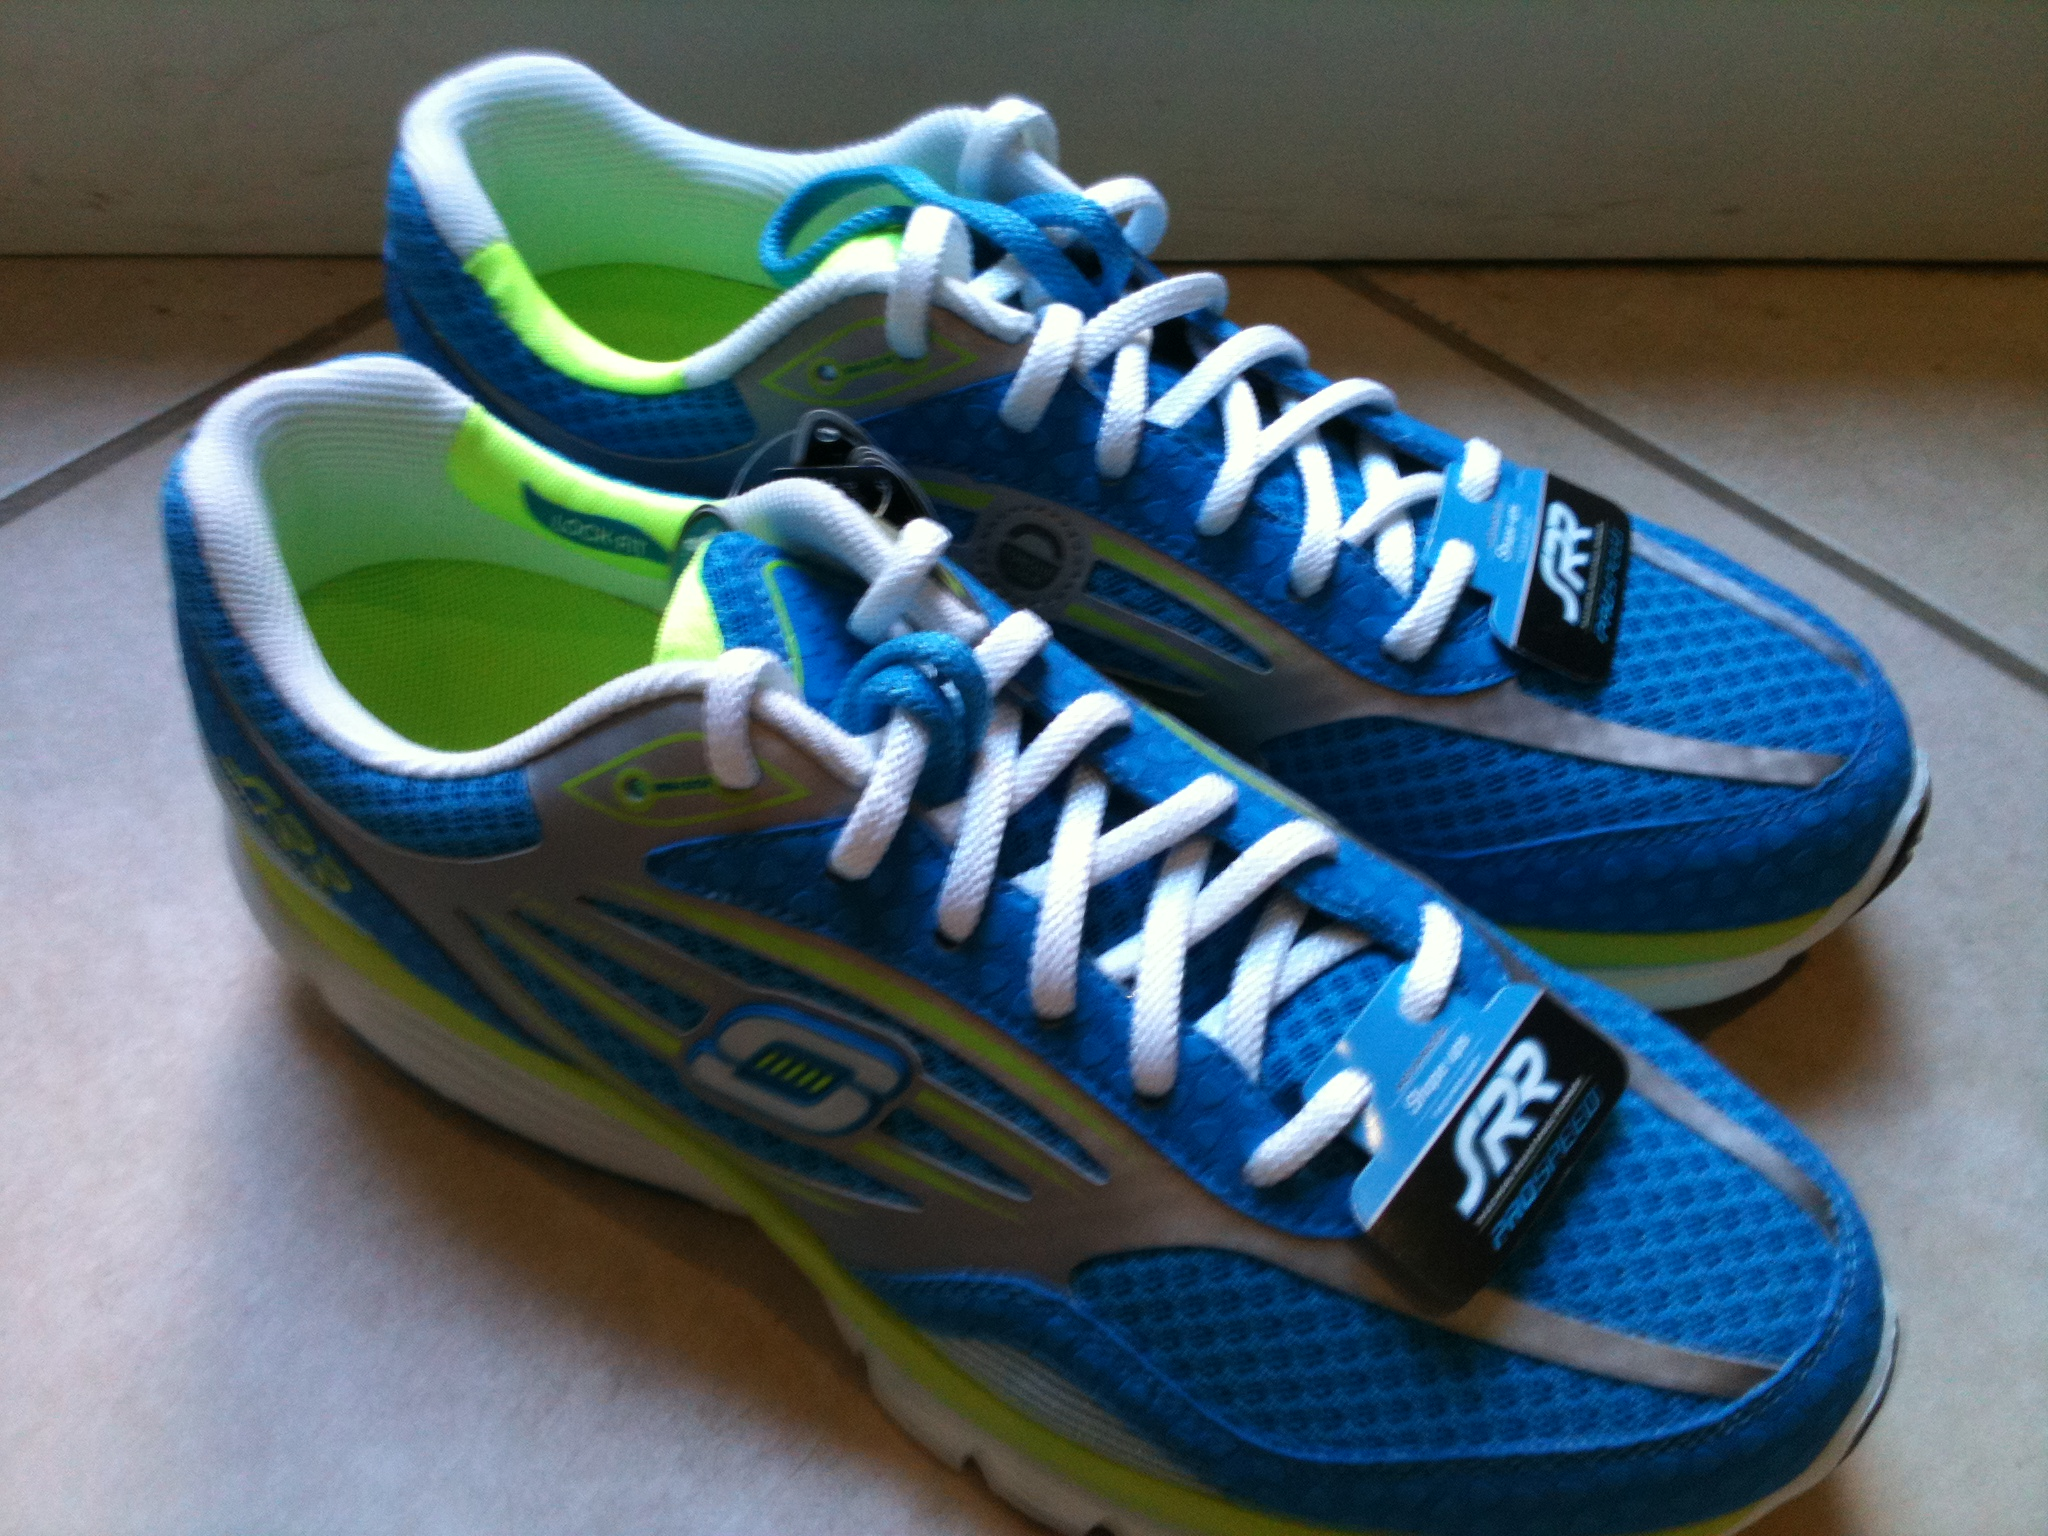 Skechers Prospeed Running Shoe Review | fairweatherrunner